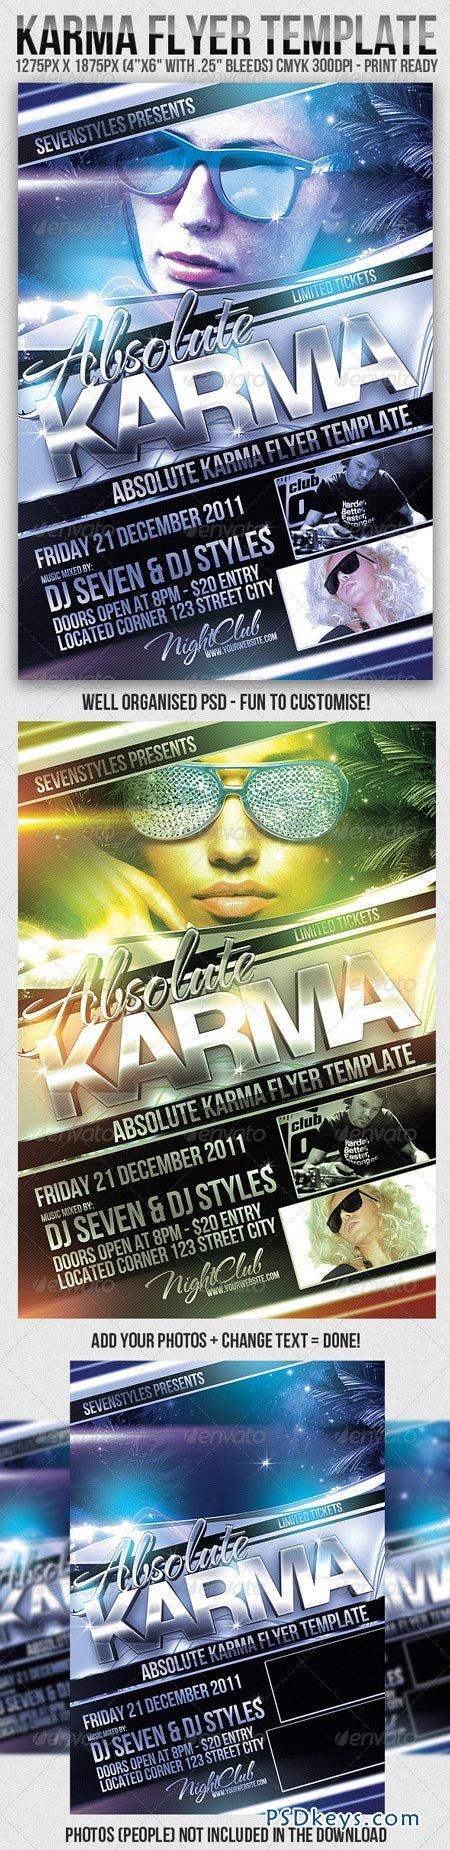 Karma Flyer Template 180384